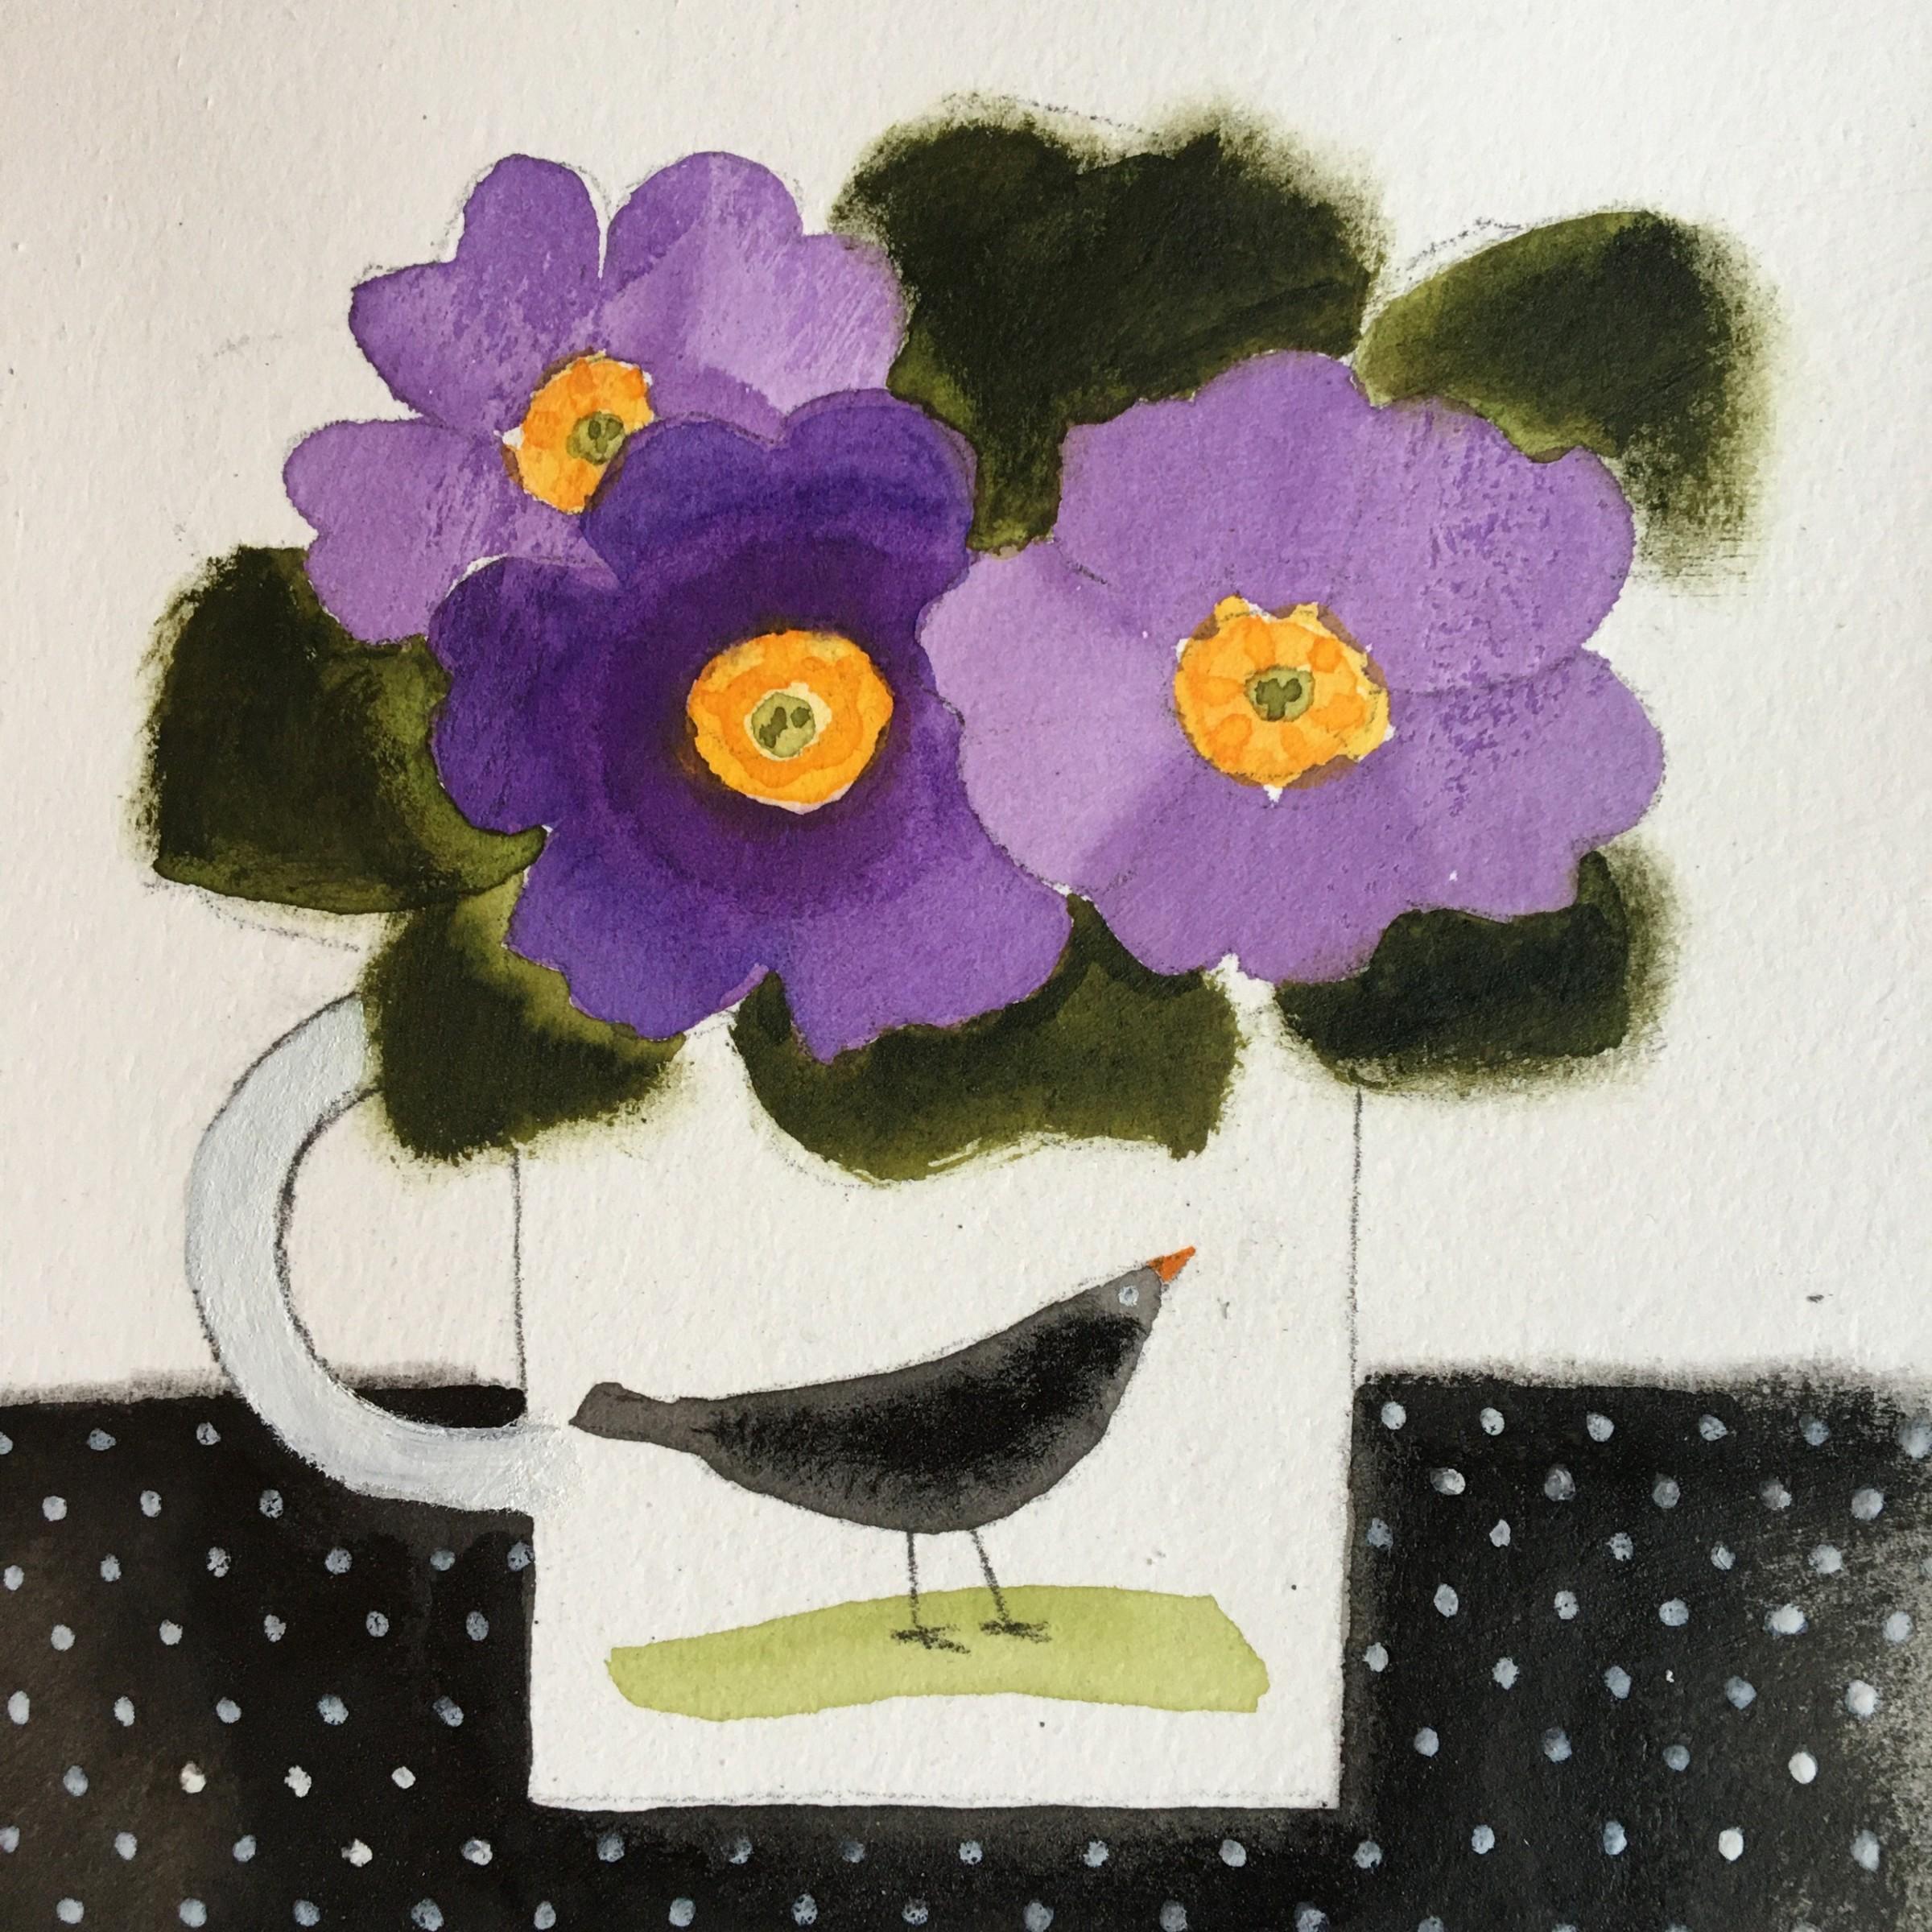 "<span class=""link fancybox-details-link""><a href=""/artists/30-jill-leman/works/12085-jill-leman-flowers-and-blackbird/"">View Detail Page</a></span><div class=""artist""><span class=""artist""><strong>Jill Leman</strong></span></div><div class=""title""><em>Flowers and Blackbird</em></div><div class=""medium"">watercolour & acrylic</div><div class=""dimensions"">Frame: 31 x 31 cm<br /> Artwork: 15 x 15 cm</div><div class=""price"">£385.00</div>"